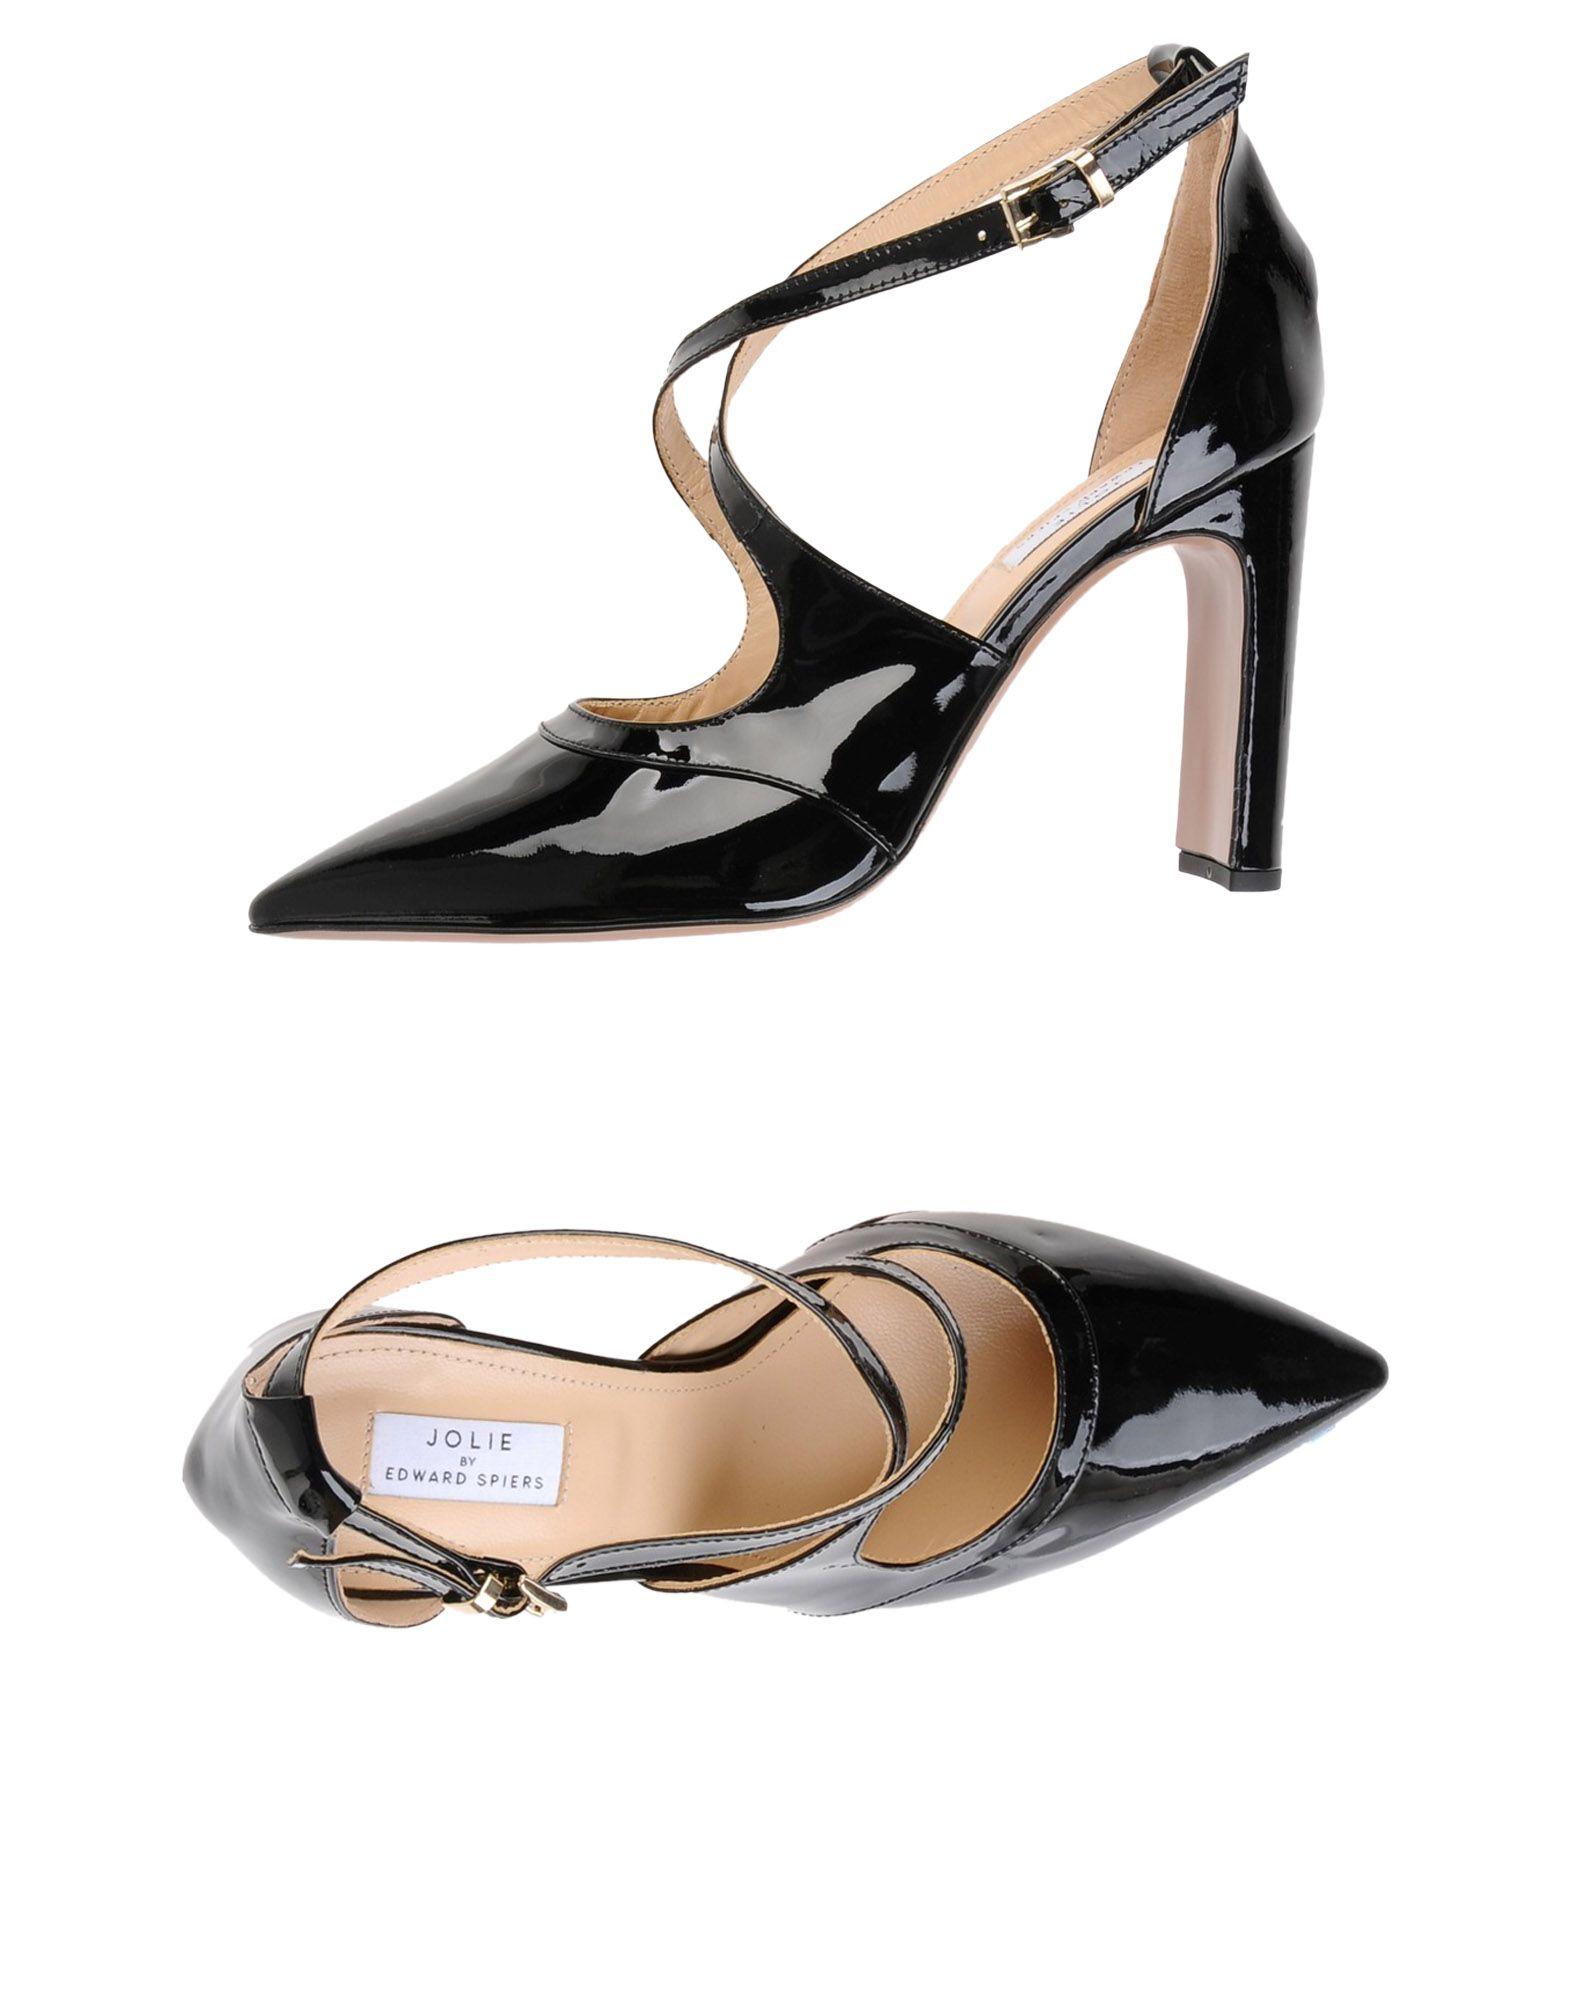 Stilvolle billige Schuhe Jolie By Edward Spiers Pumps Damen  11526585VP